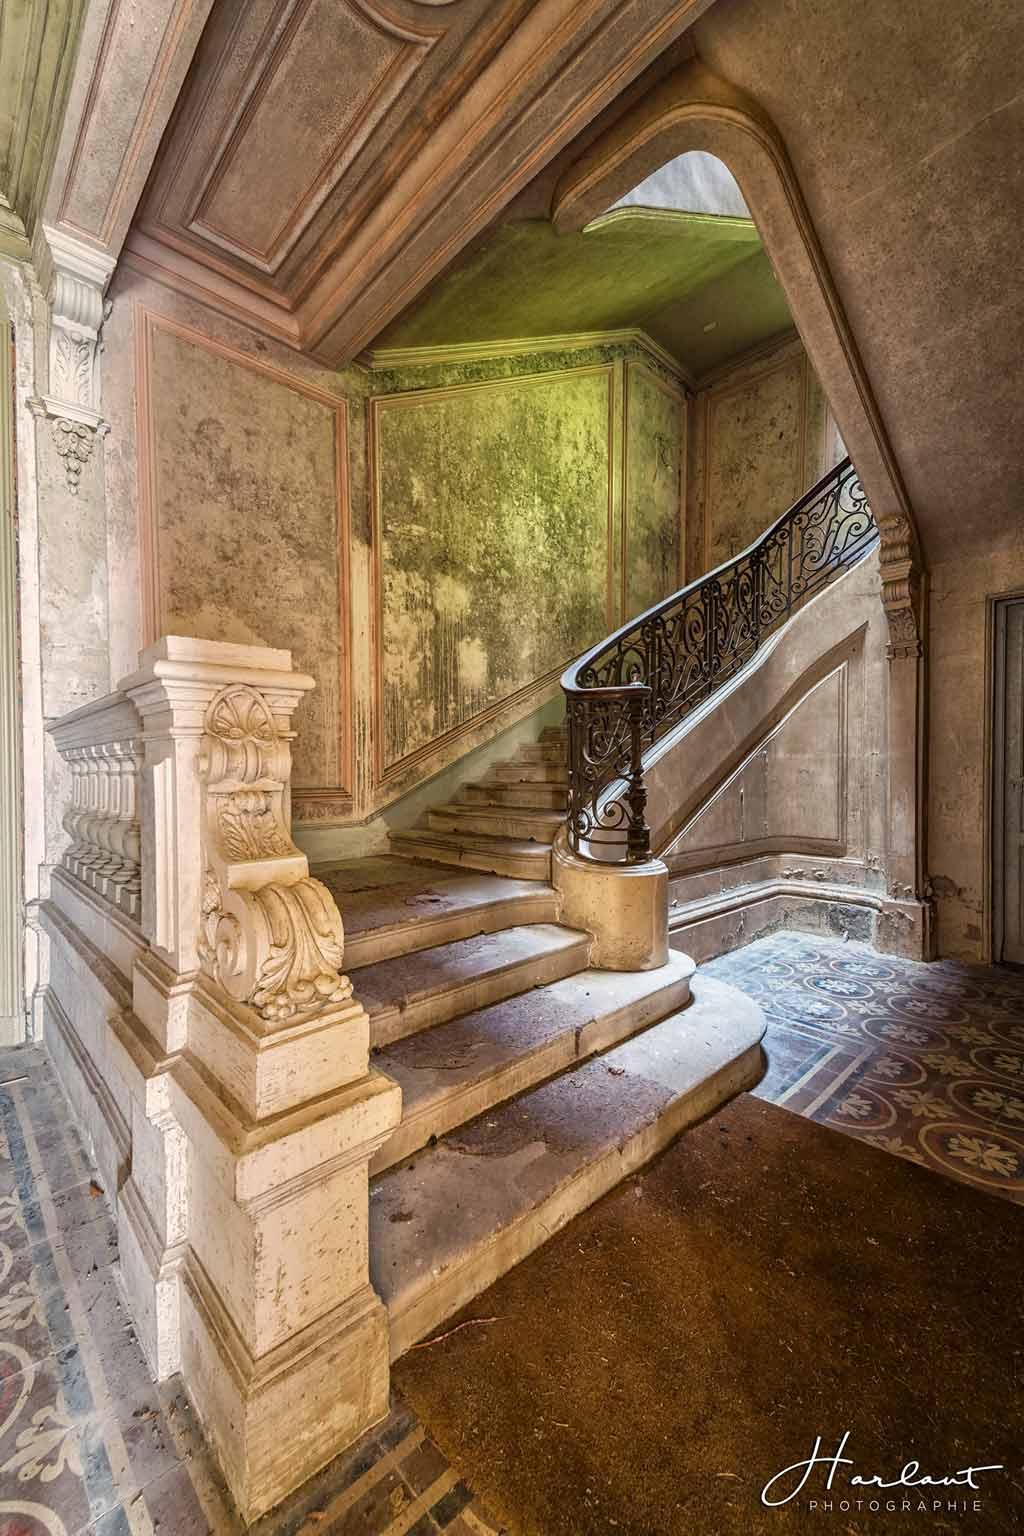 Julien-Harlaut---Escalier_0062